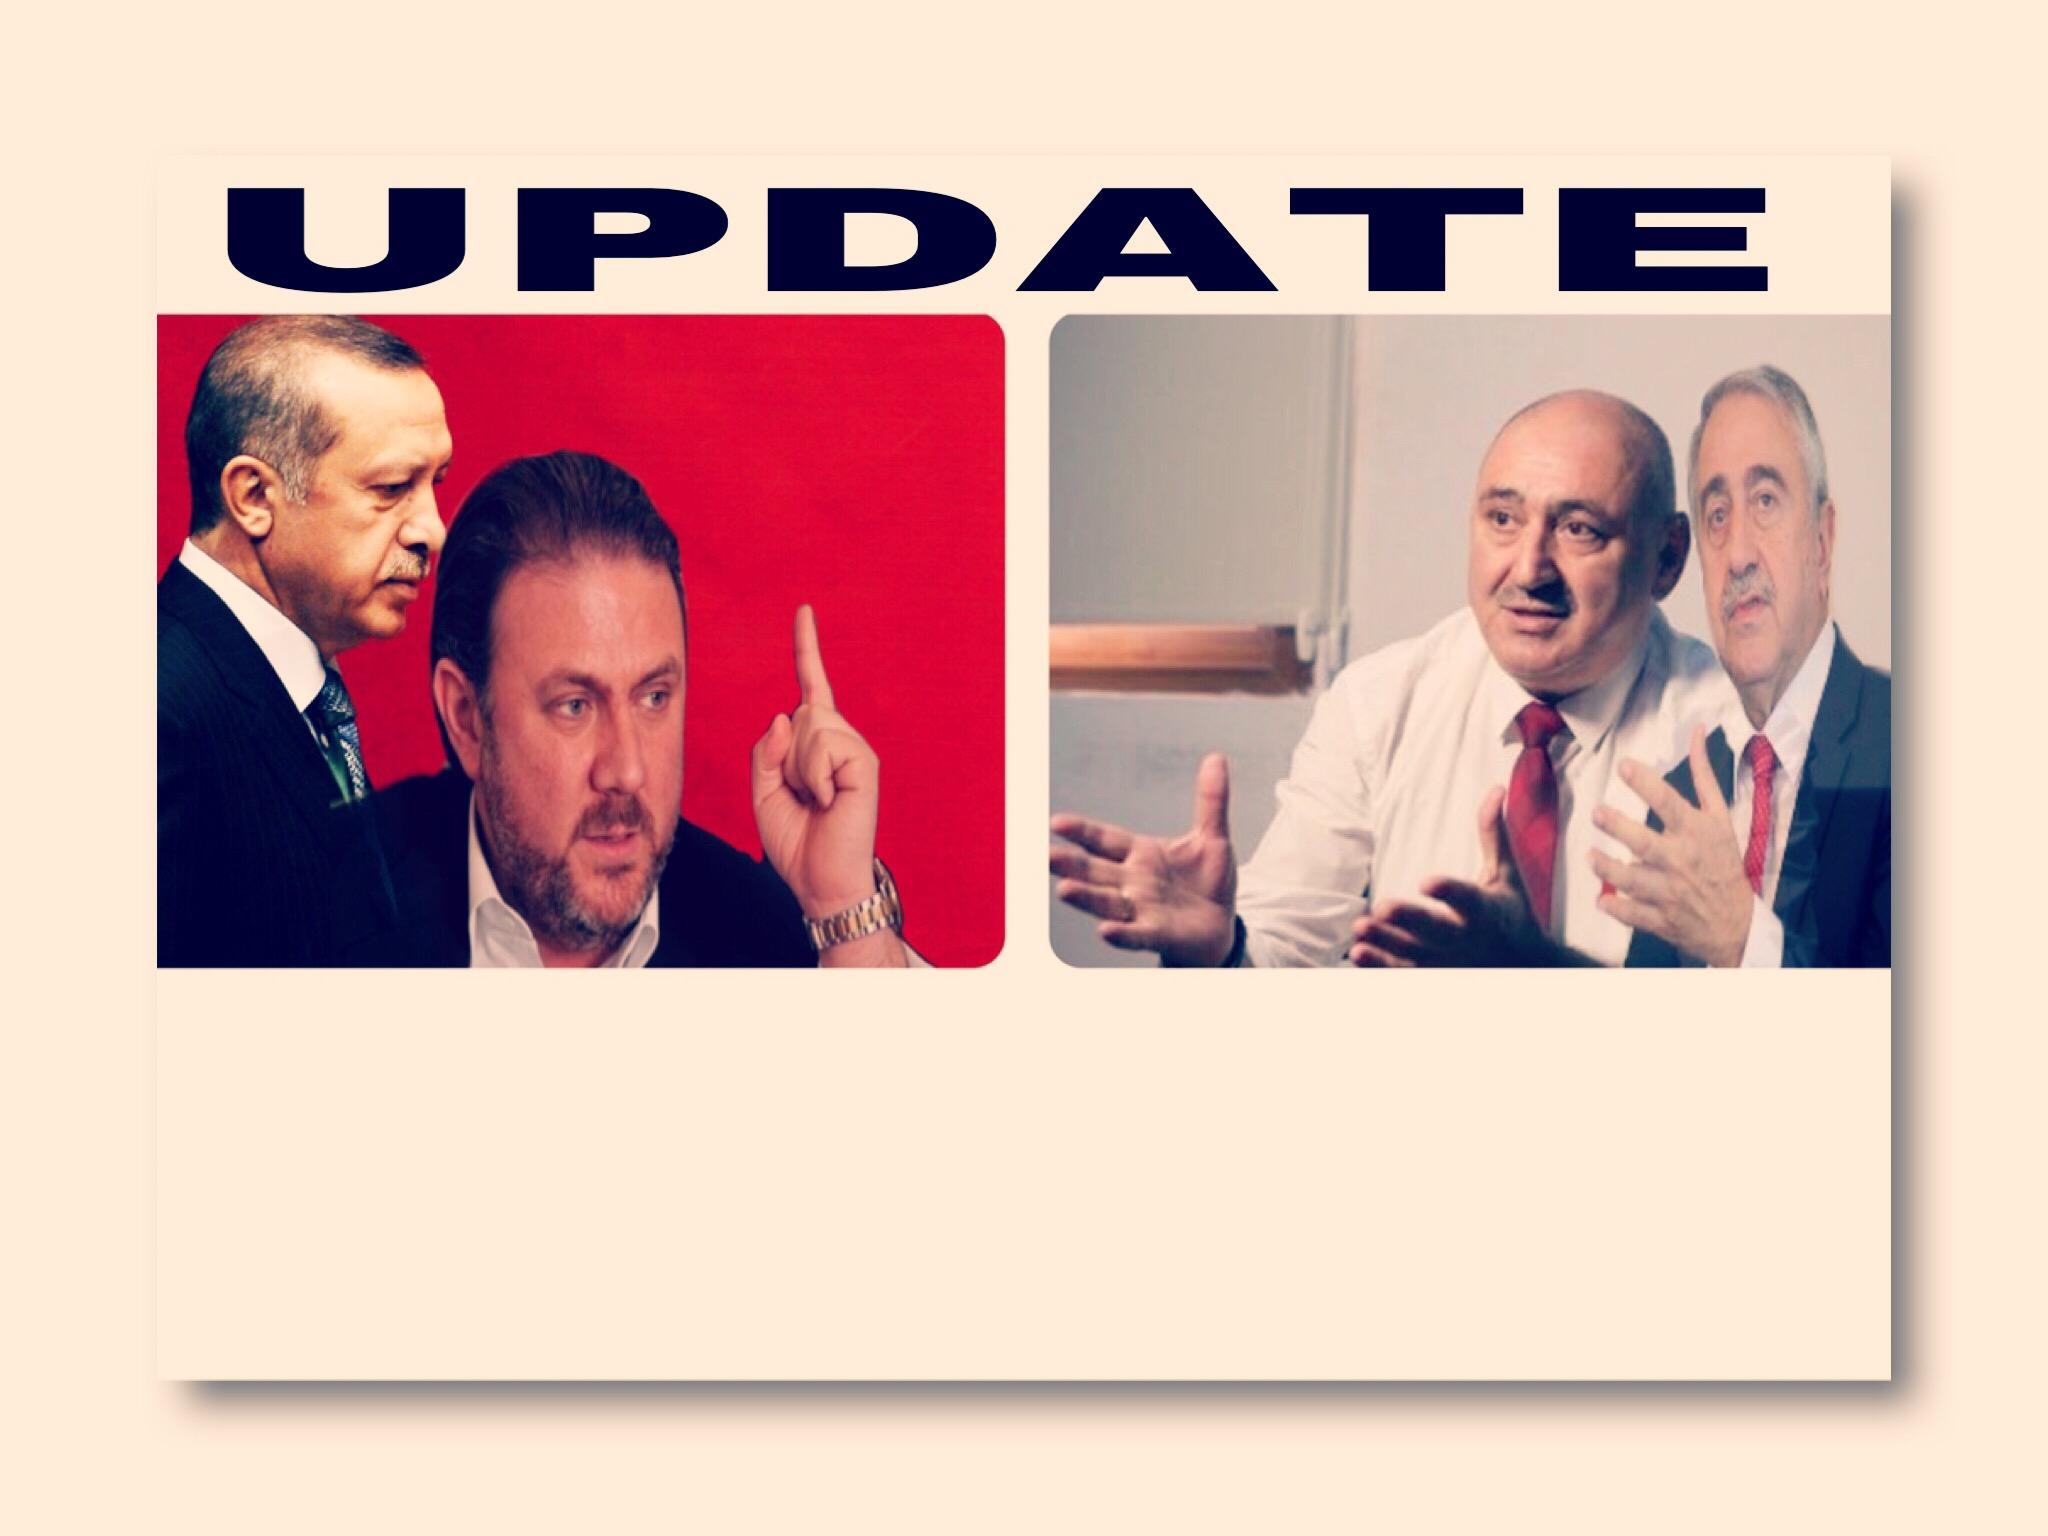 UPDATE/Τουρκία - Δεν Μπορεί να Υπάρξει Αναγνώριση του Ψευδοκράτους